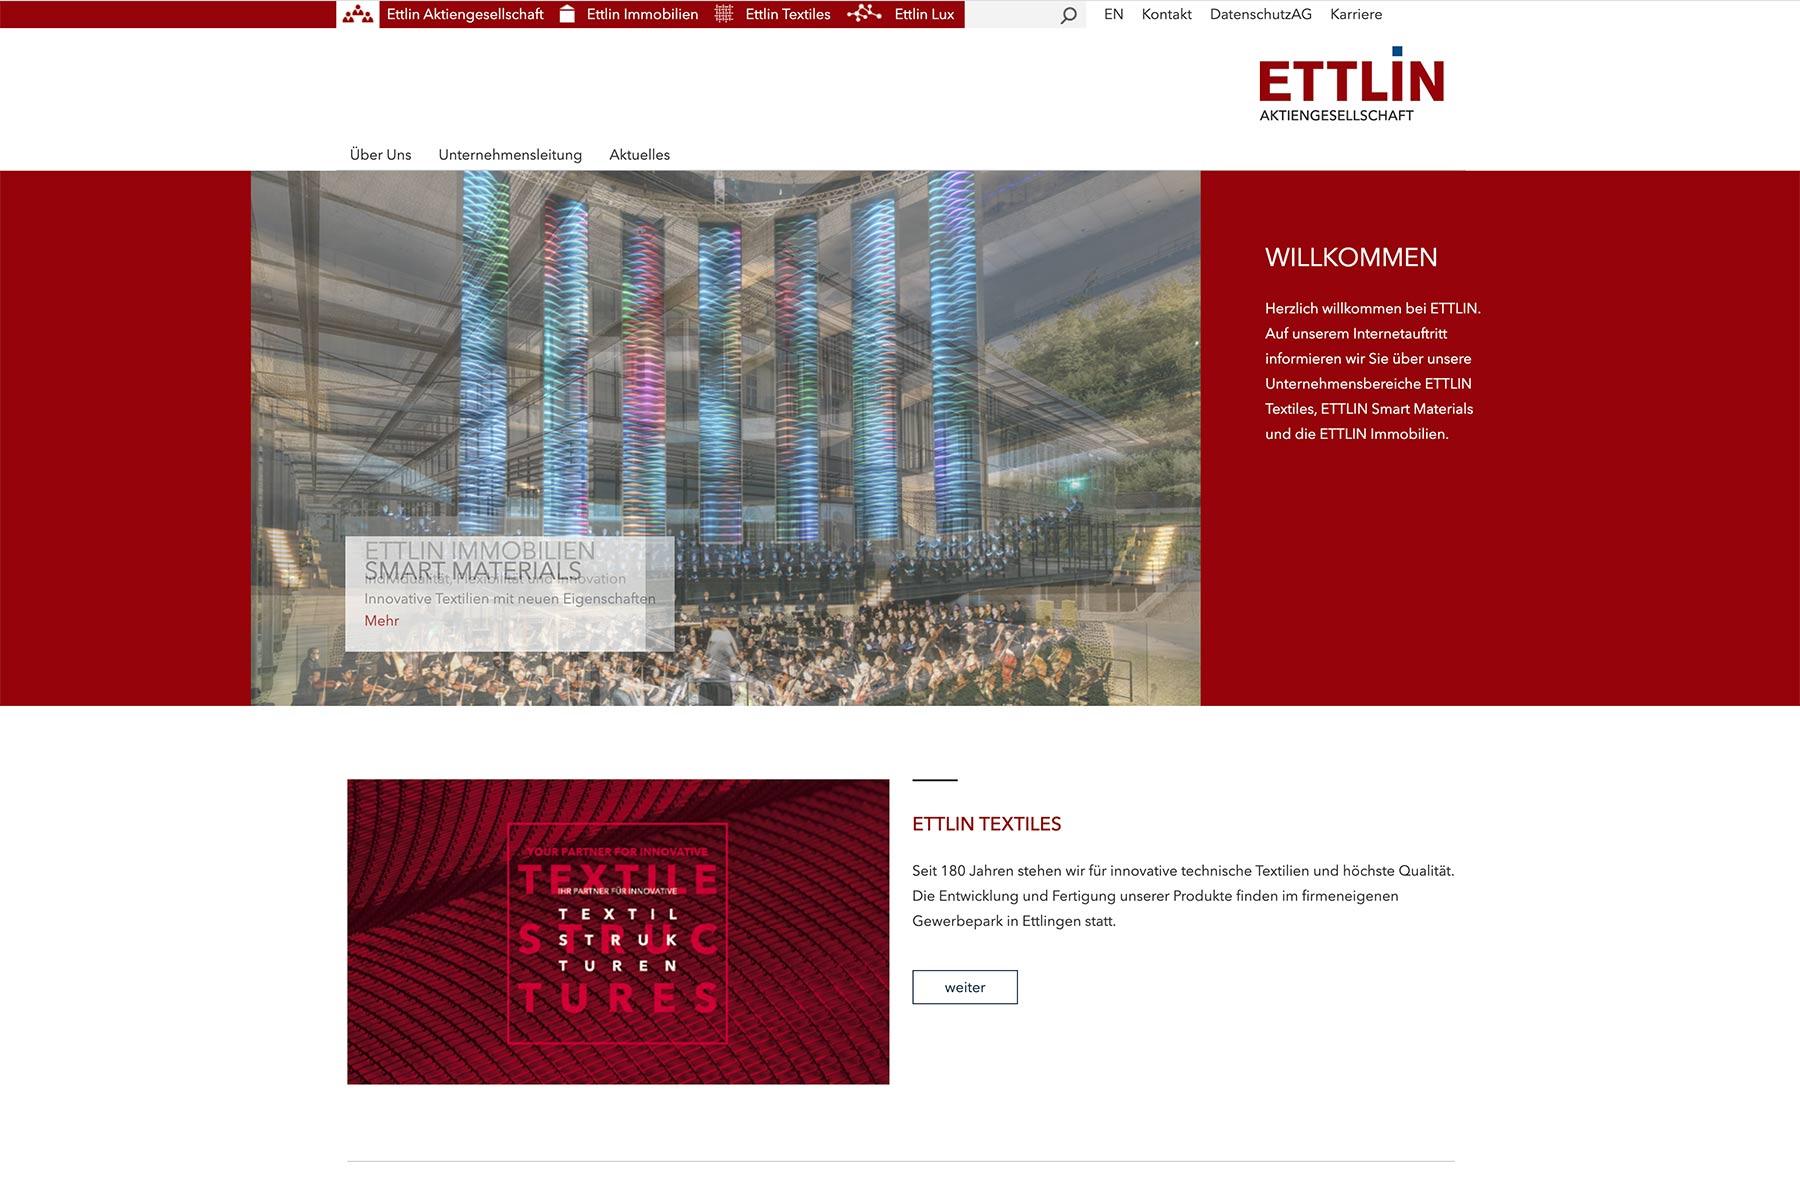 Ettlin Interaction Design Webdesign Typo3